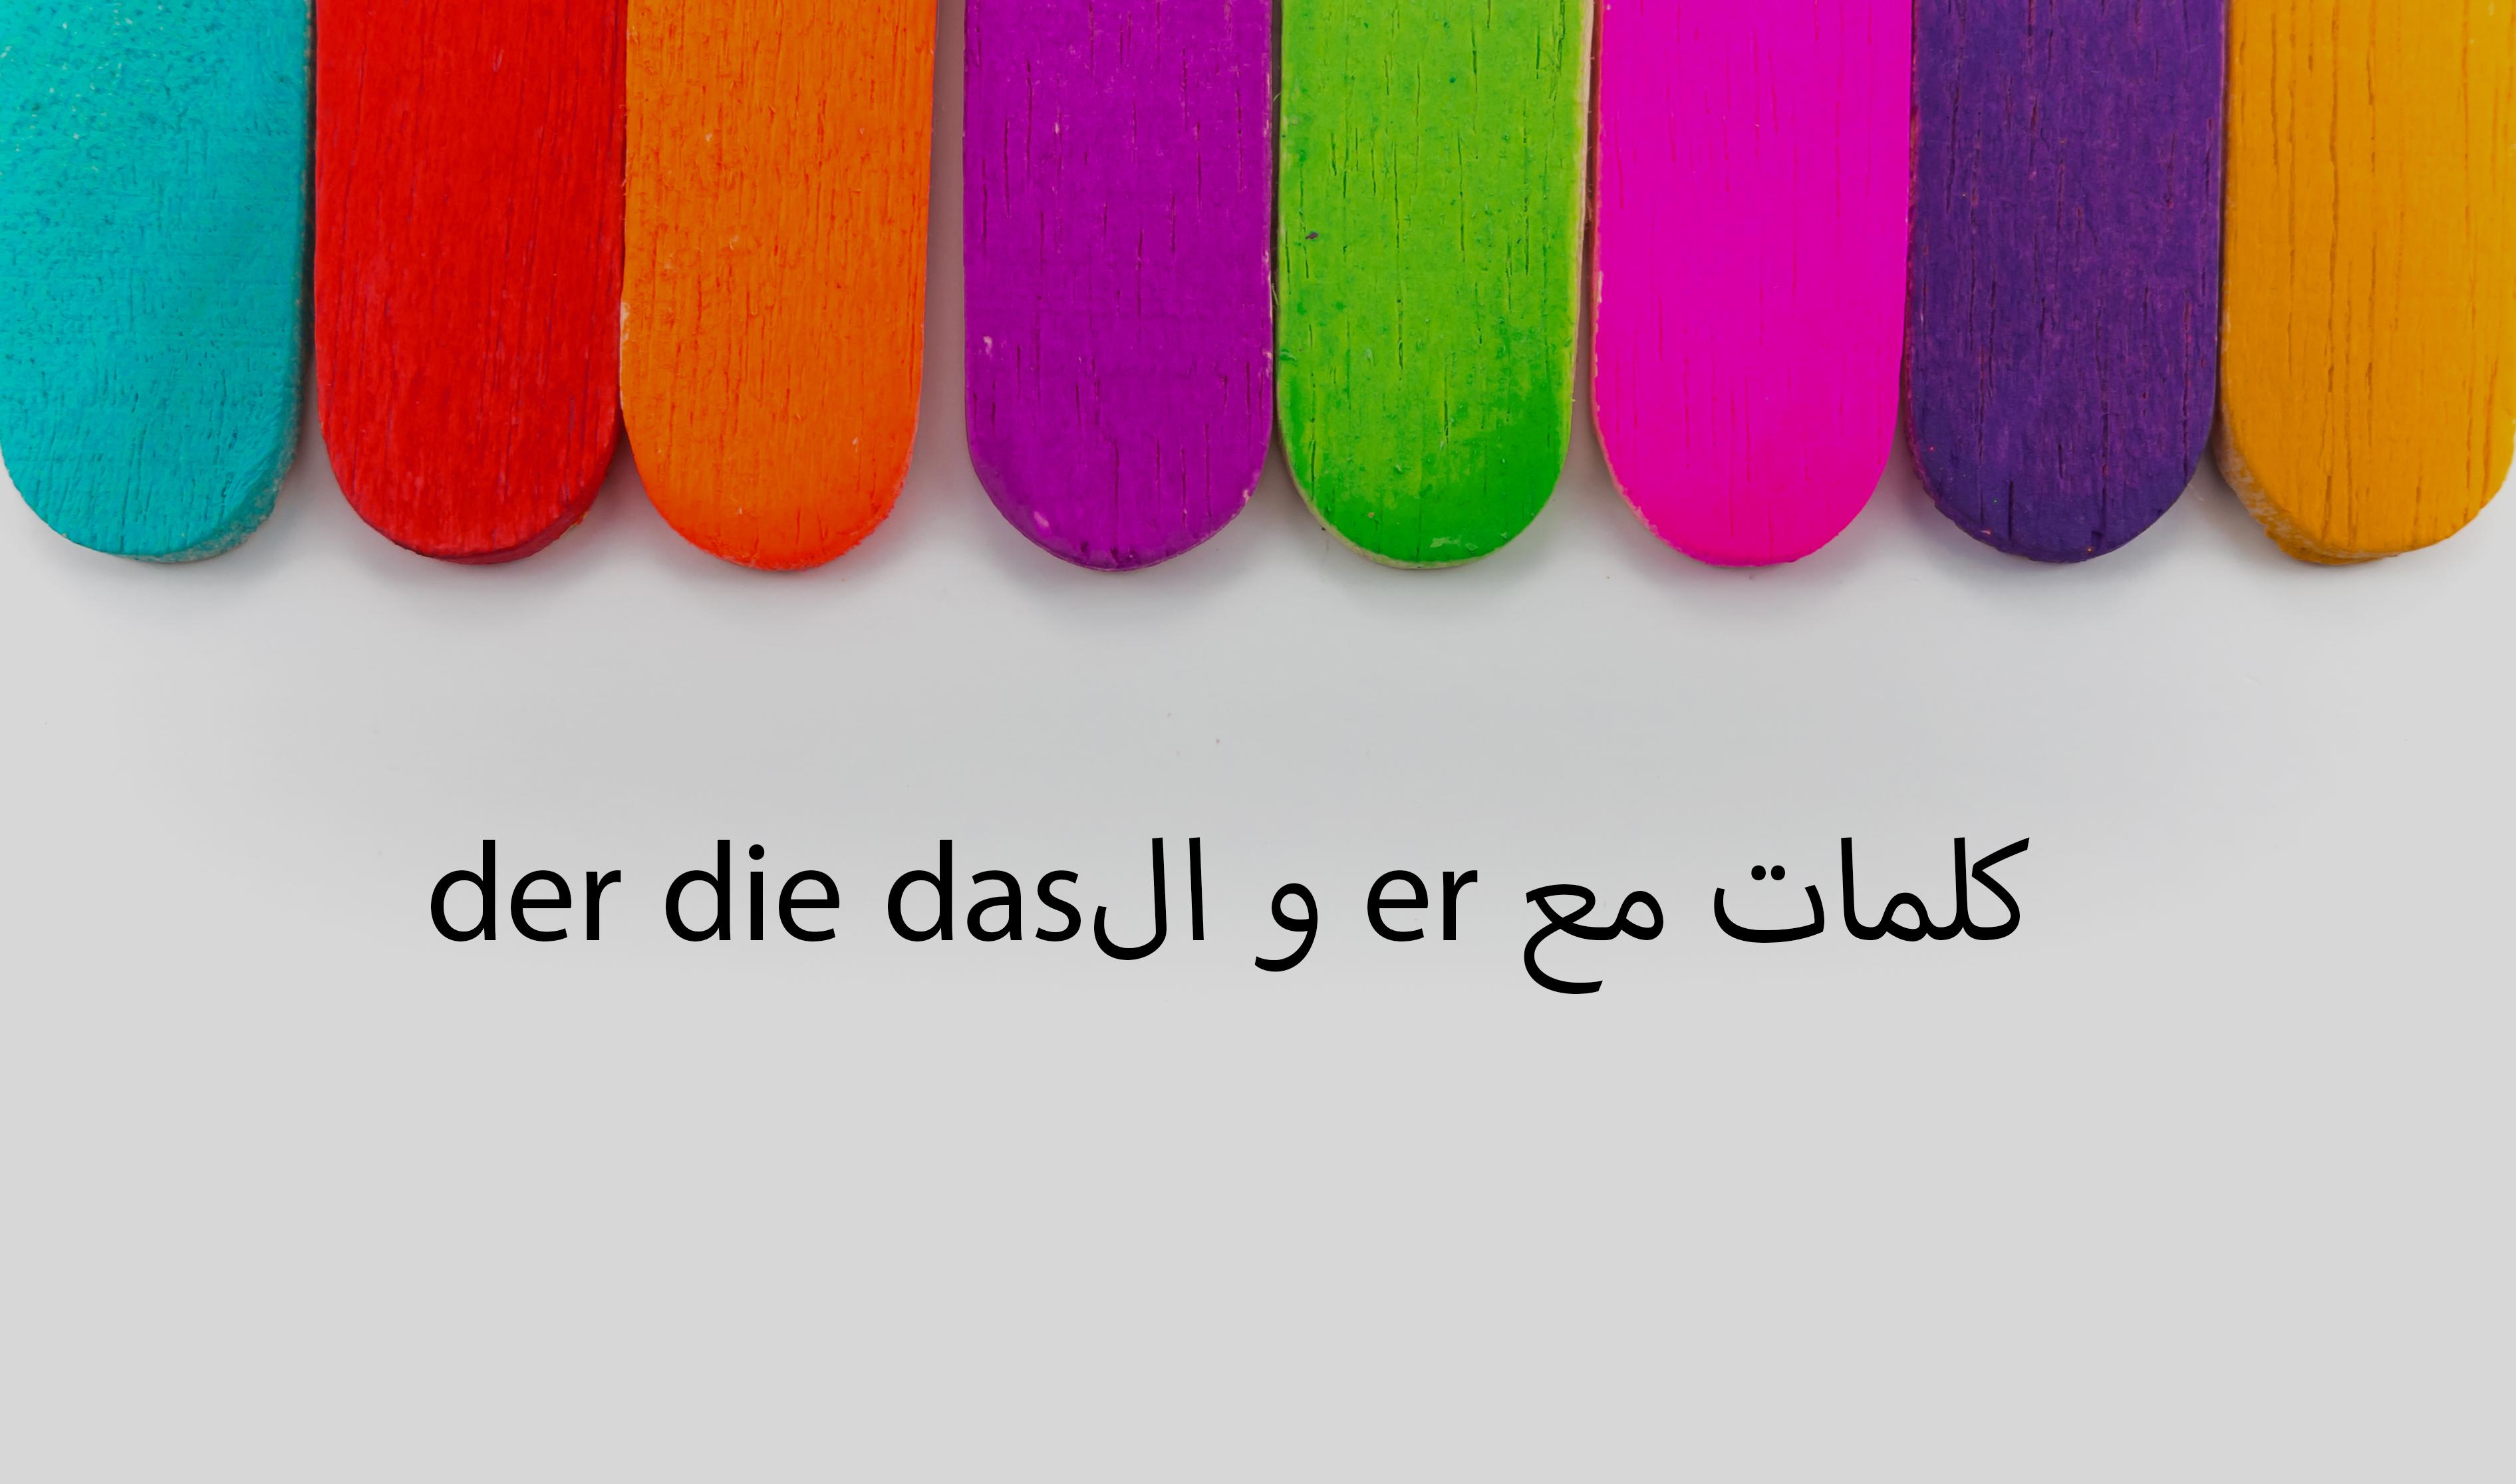 كلمات مع er و الder die das